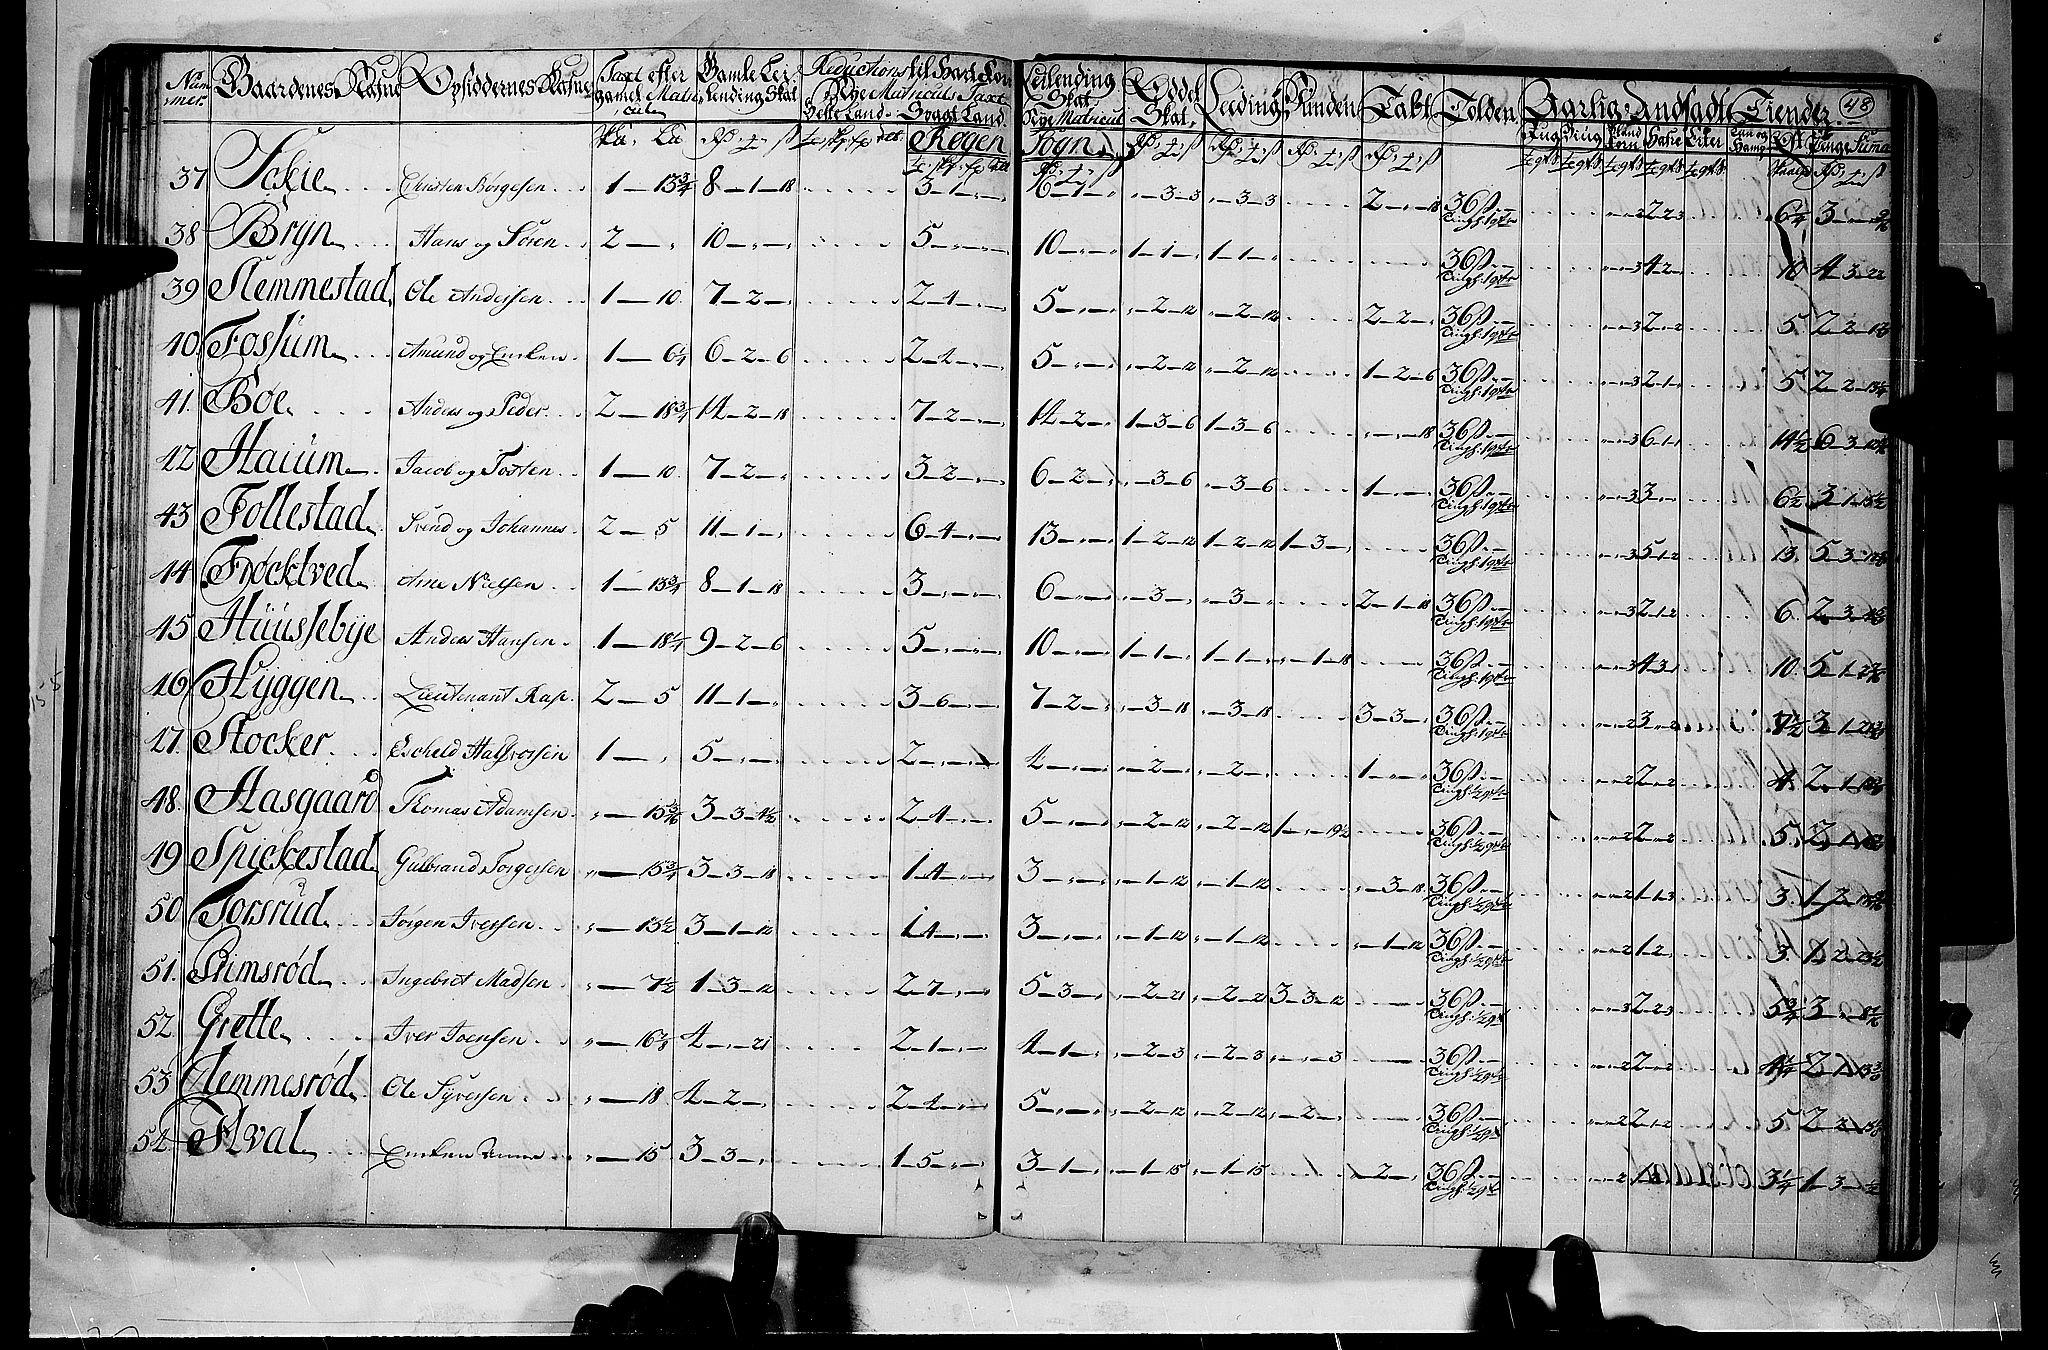 RA, Rentekammeret inntil 1814, Realistisk ordnet avdeling, N/Nb/Nbf/L0112: Buskerud matrikkelprotokoll, 1723, s. 47b-48a